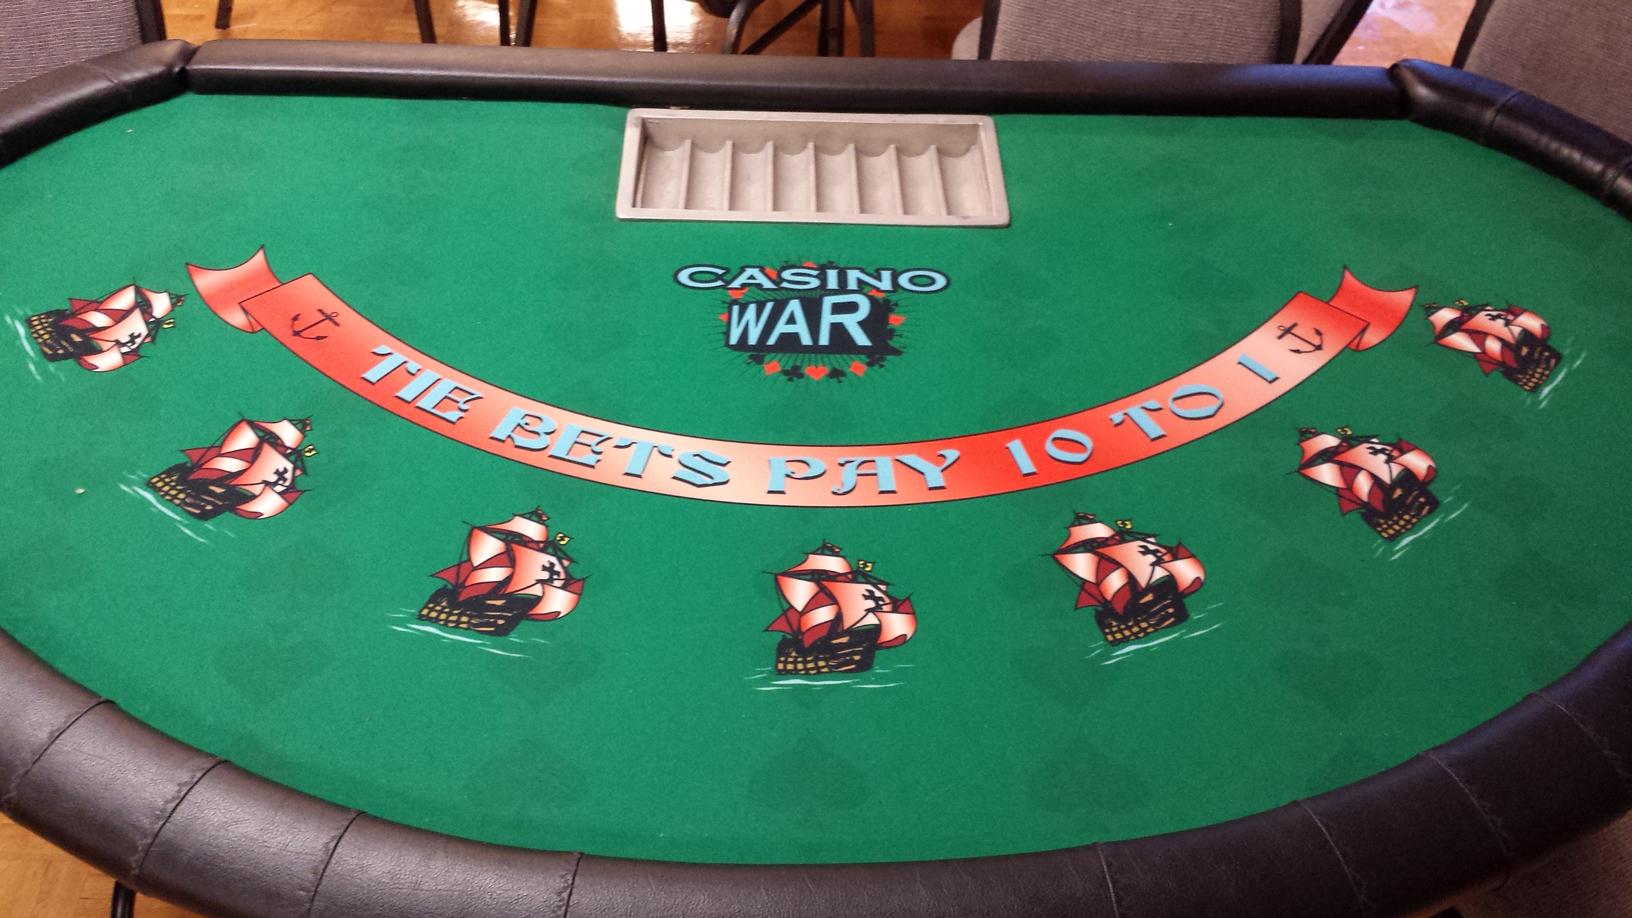 Tricks to win casino war